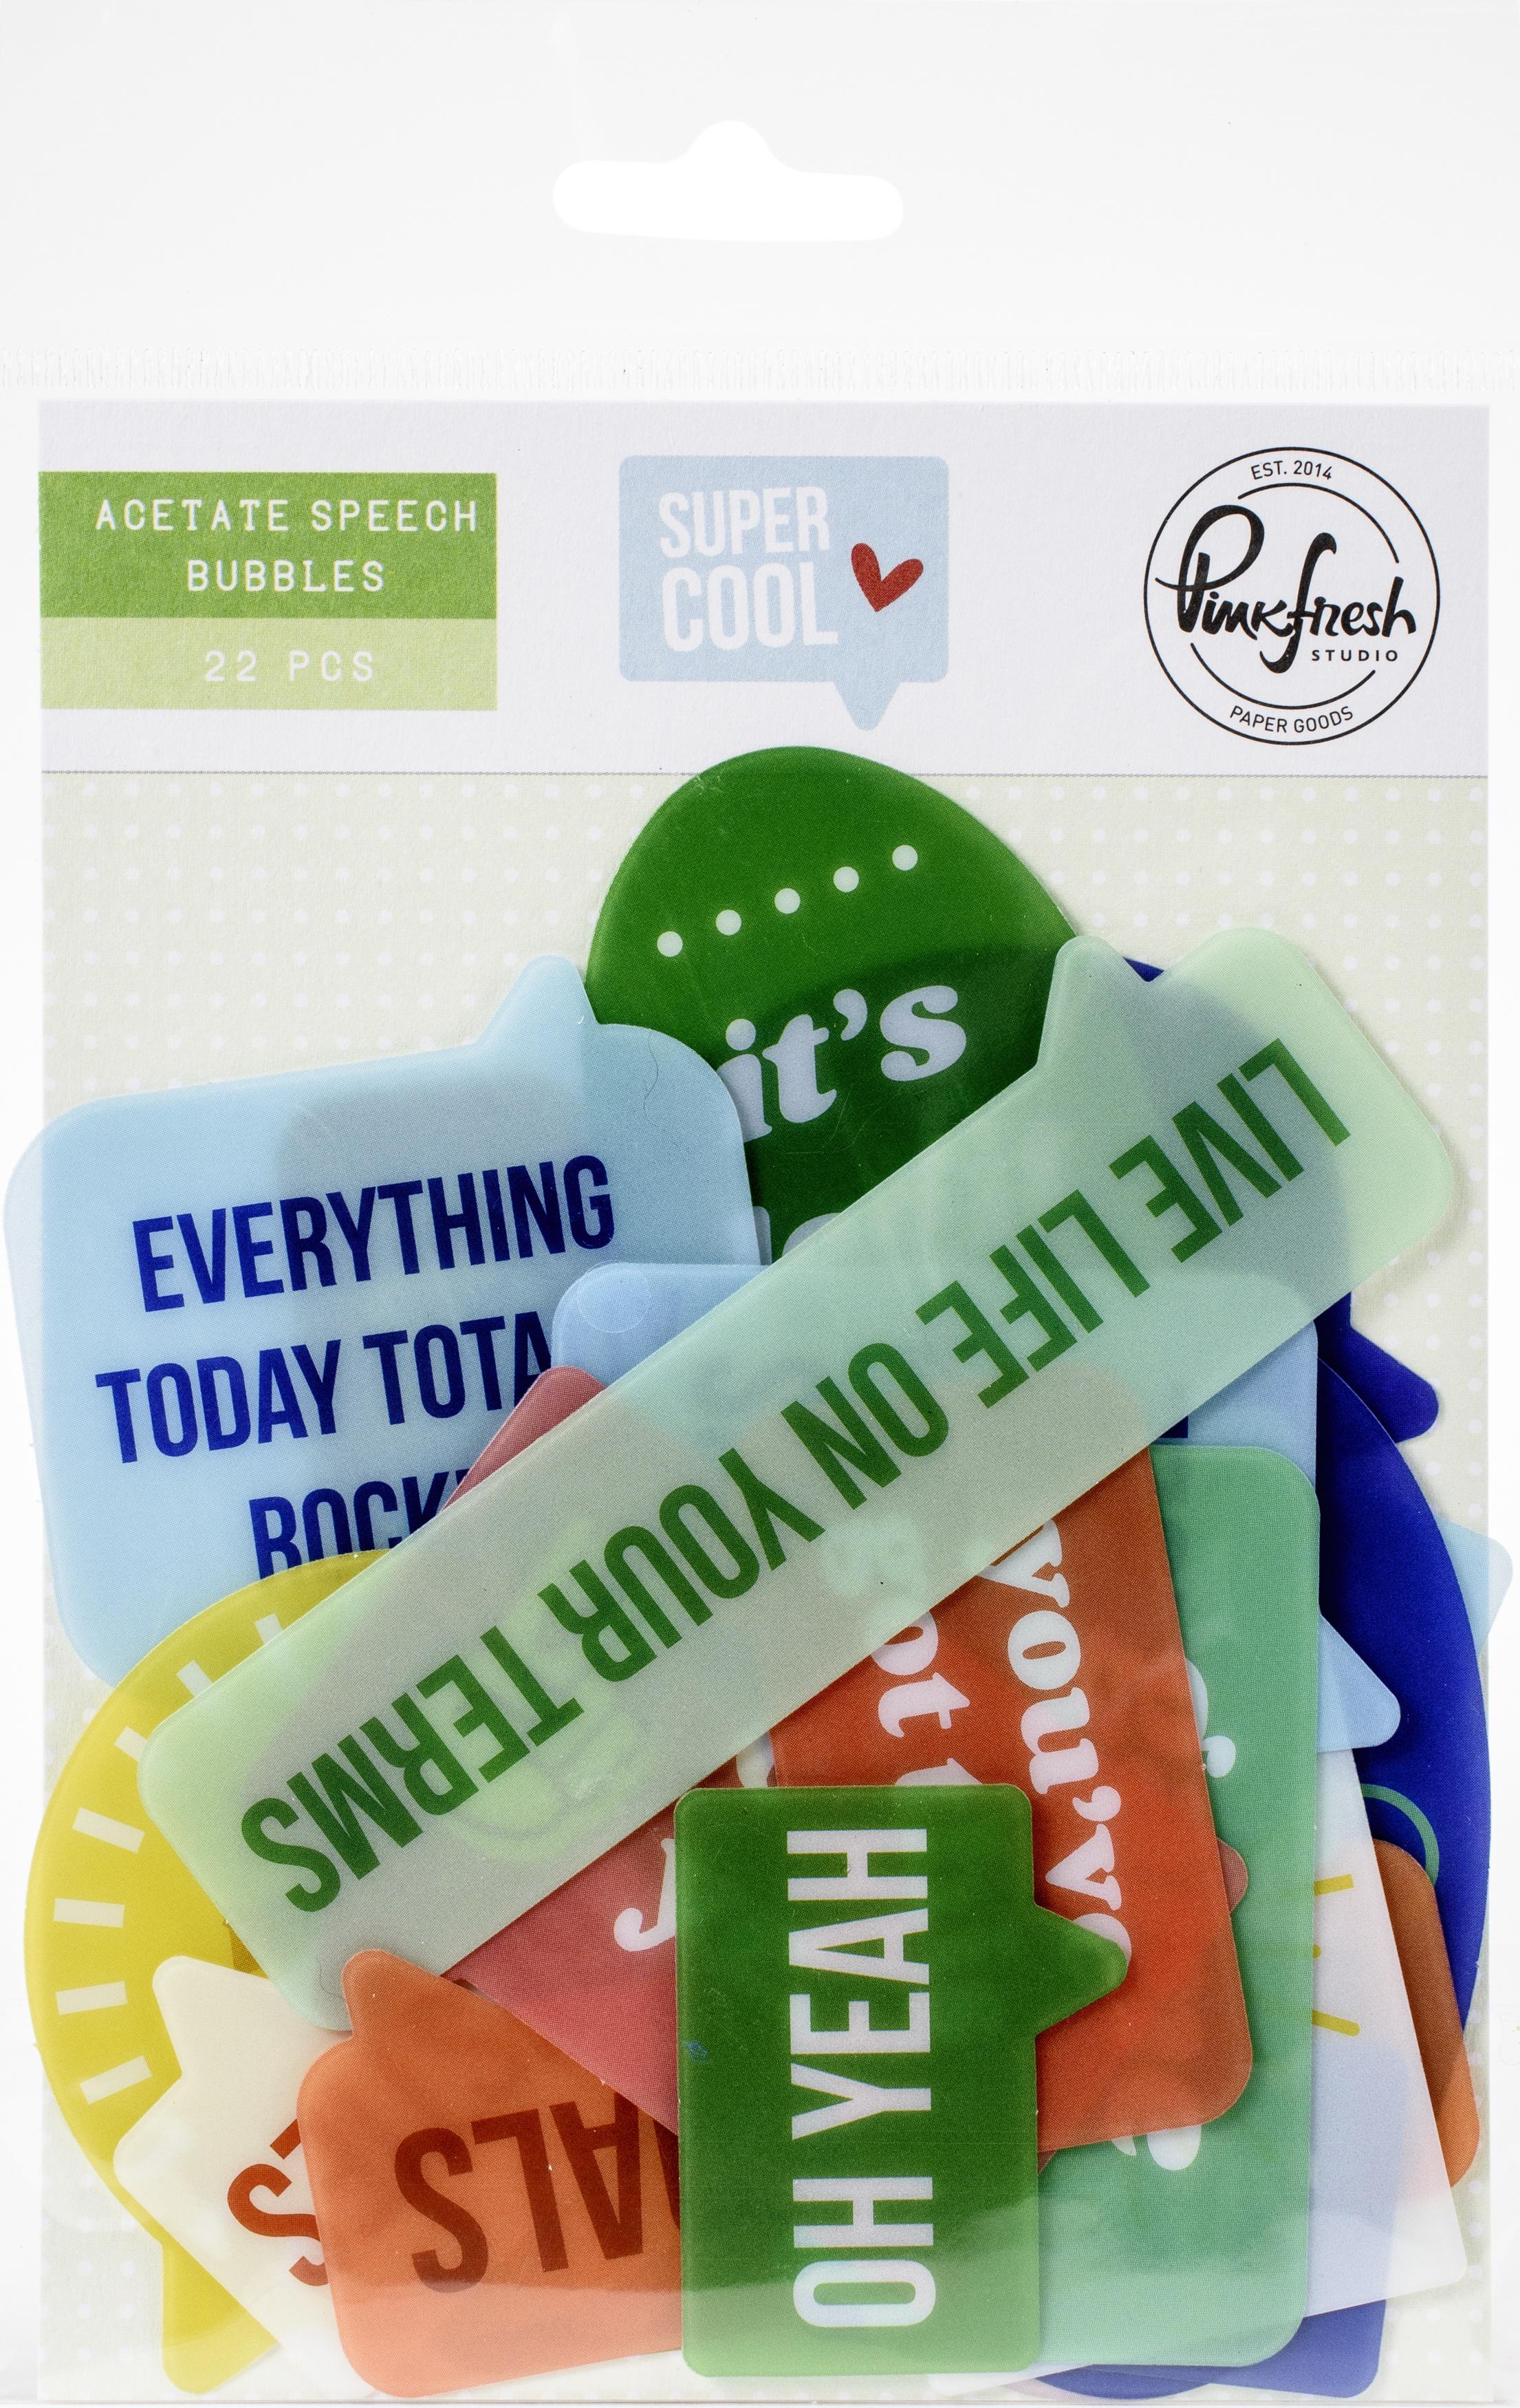 Pinkfresh Acetate Speech Bubbles Die-Cuts-Super Cool